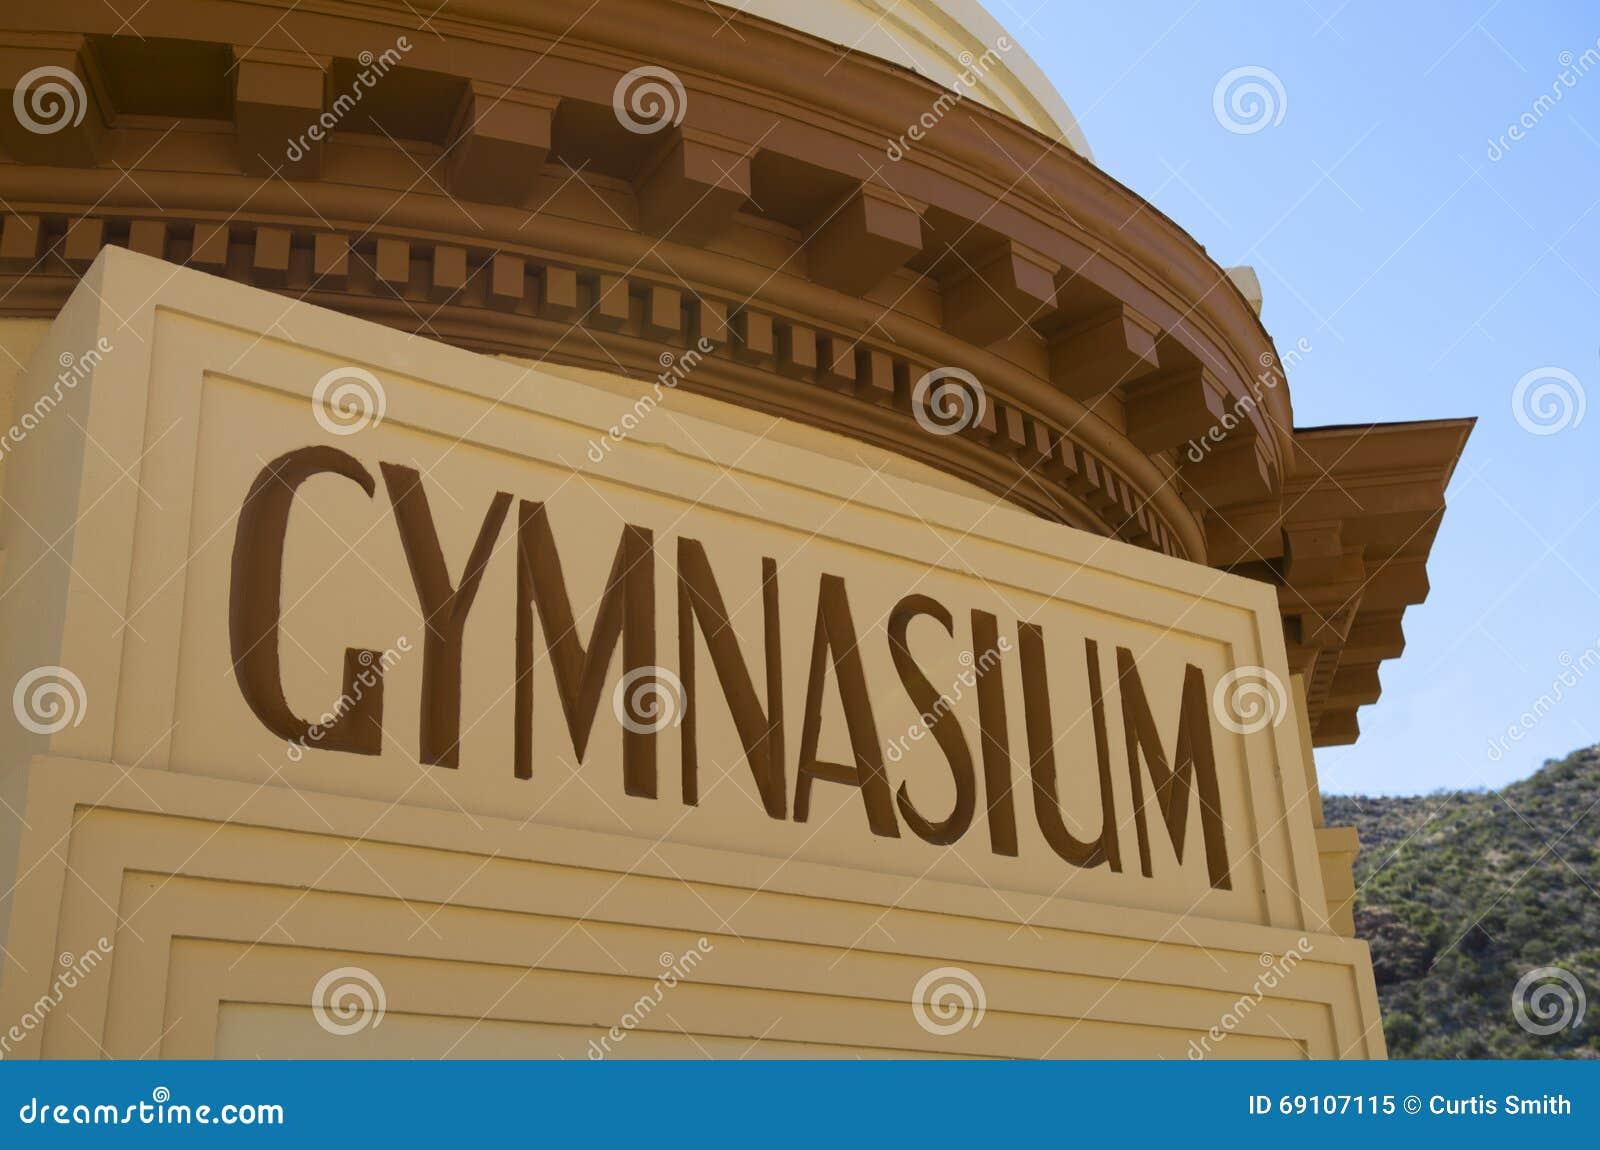 Знак шатёр здания спортзала стиля Арт Деко